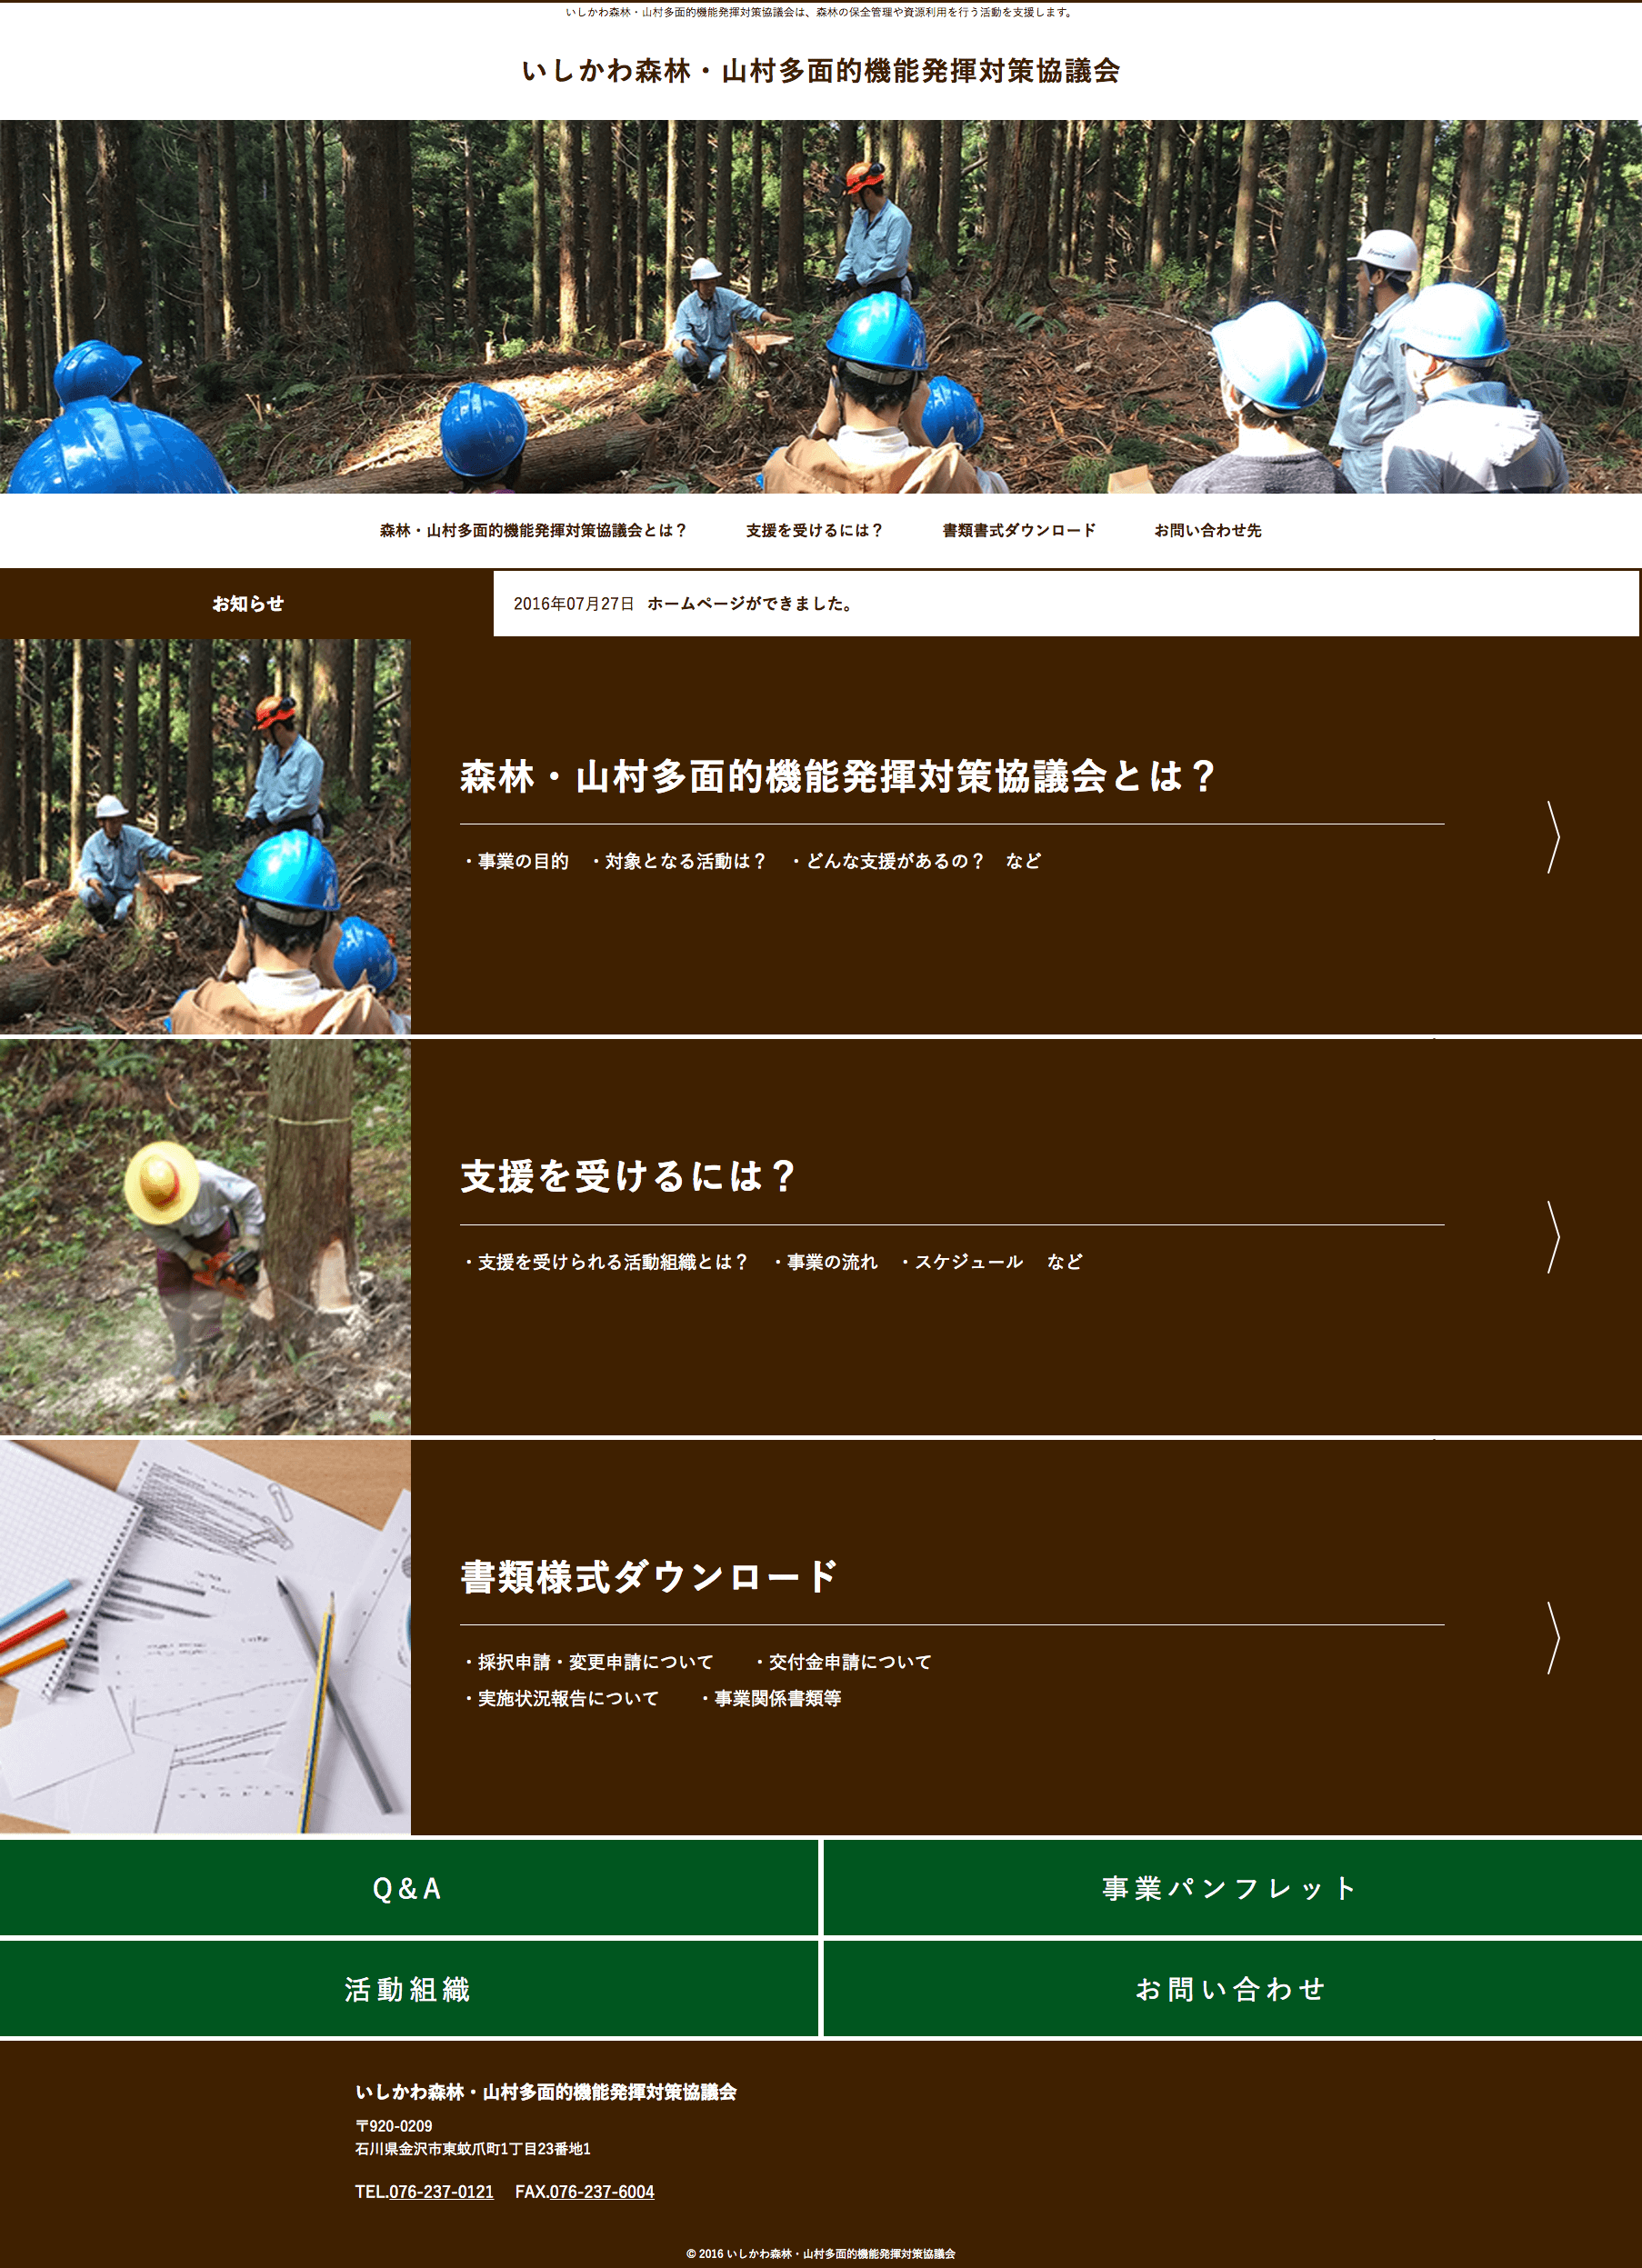 screencapture-tamenteki-ishikawa-moriren-jp-1470801837646